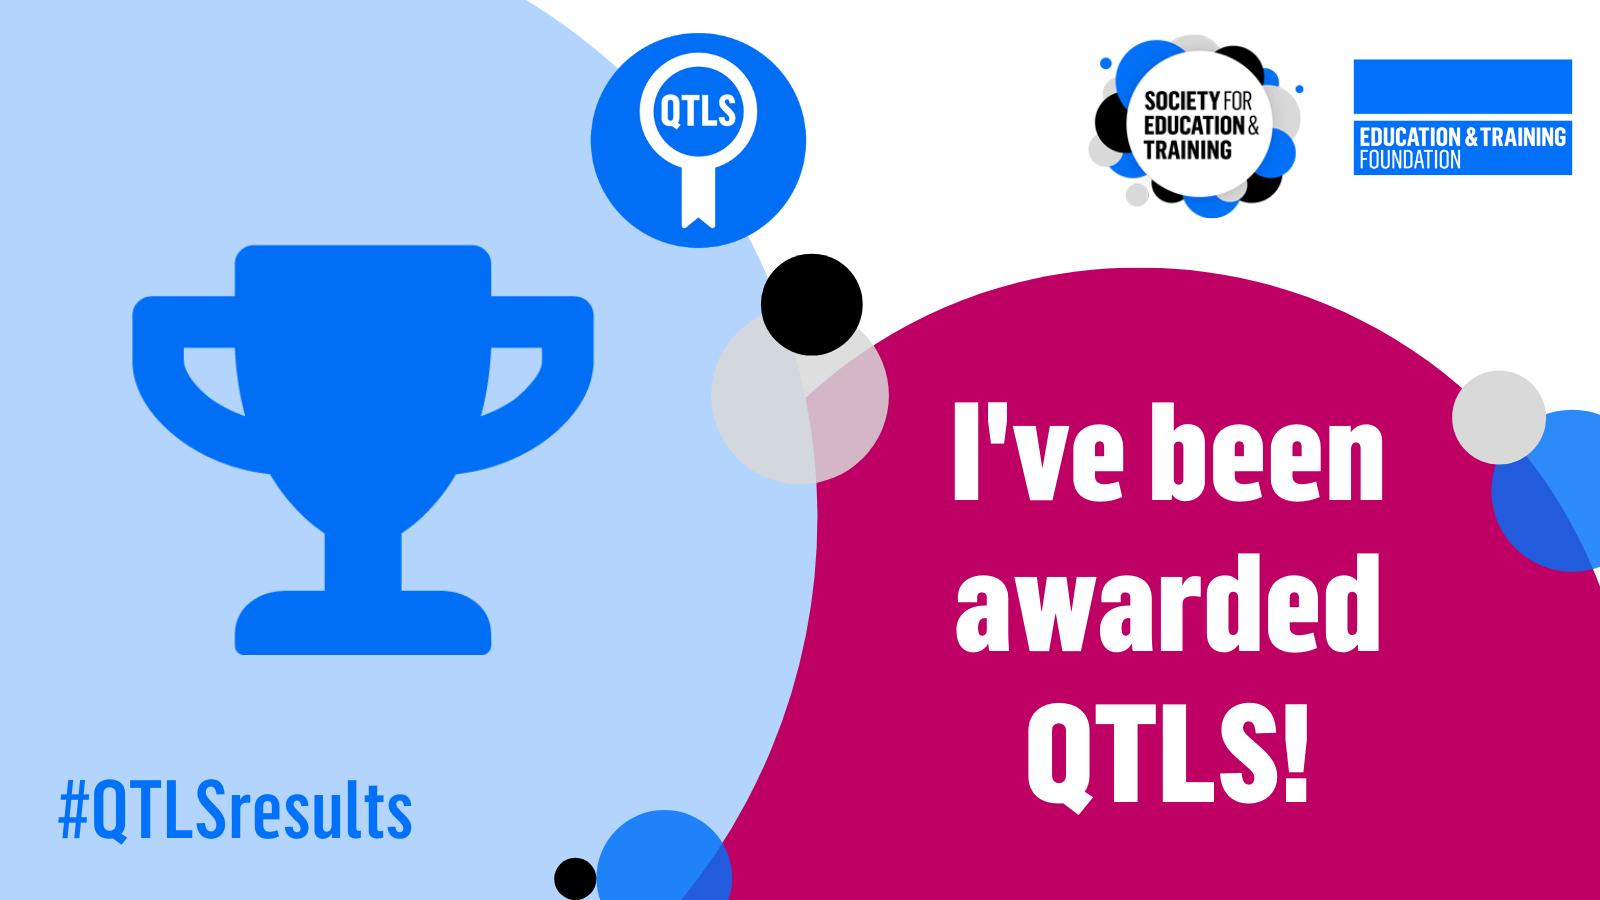 Awarded QTLS Twitter graphic